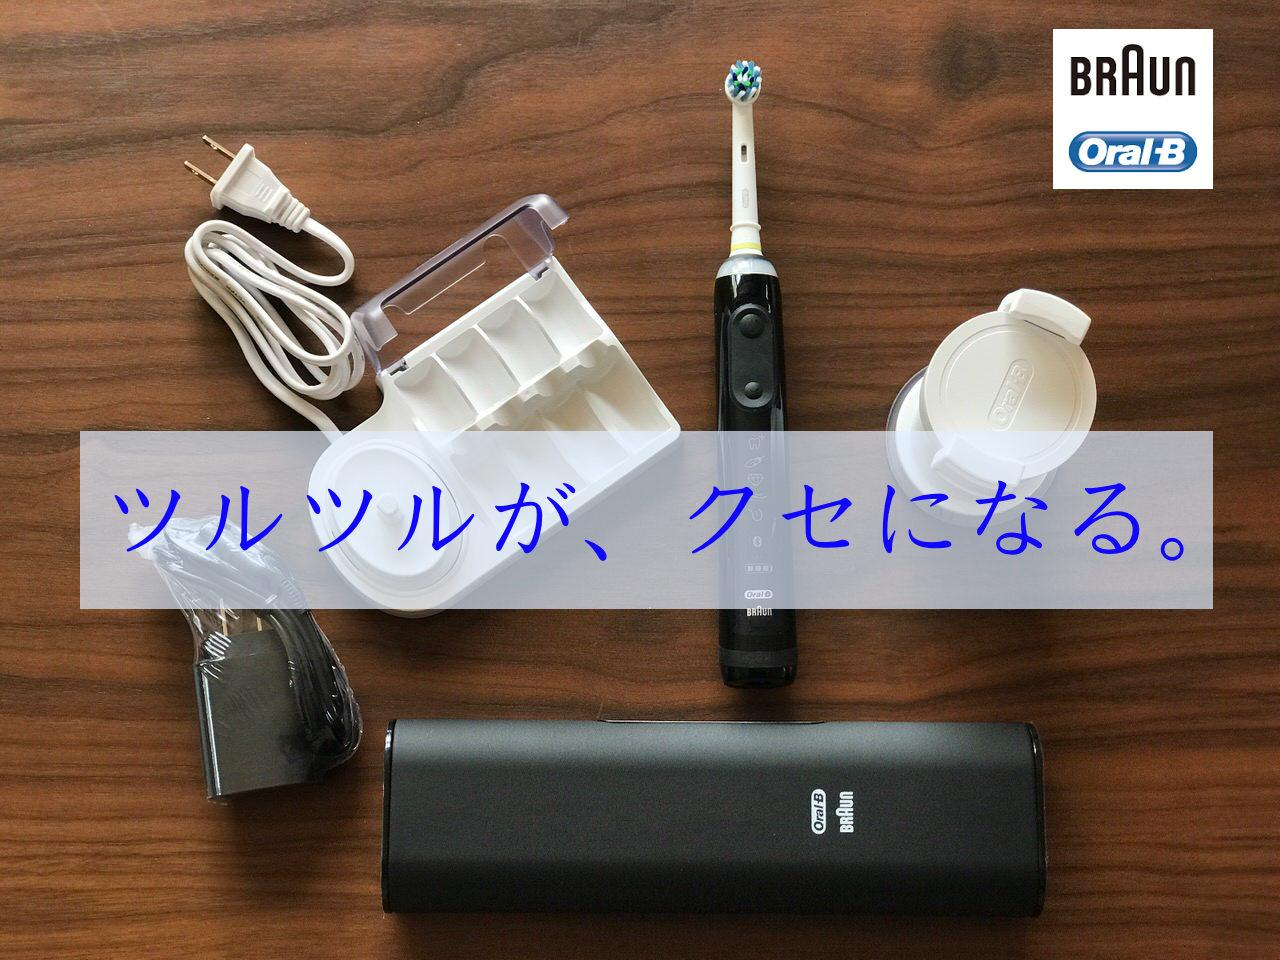 Braun oral b genius 9000a 0134b 1